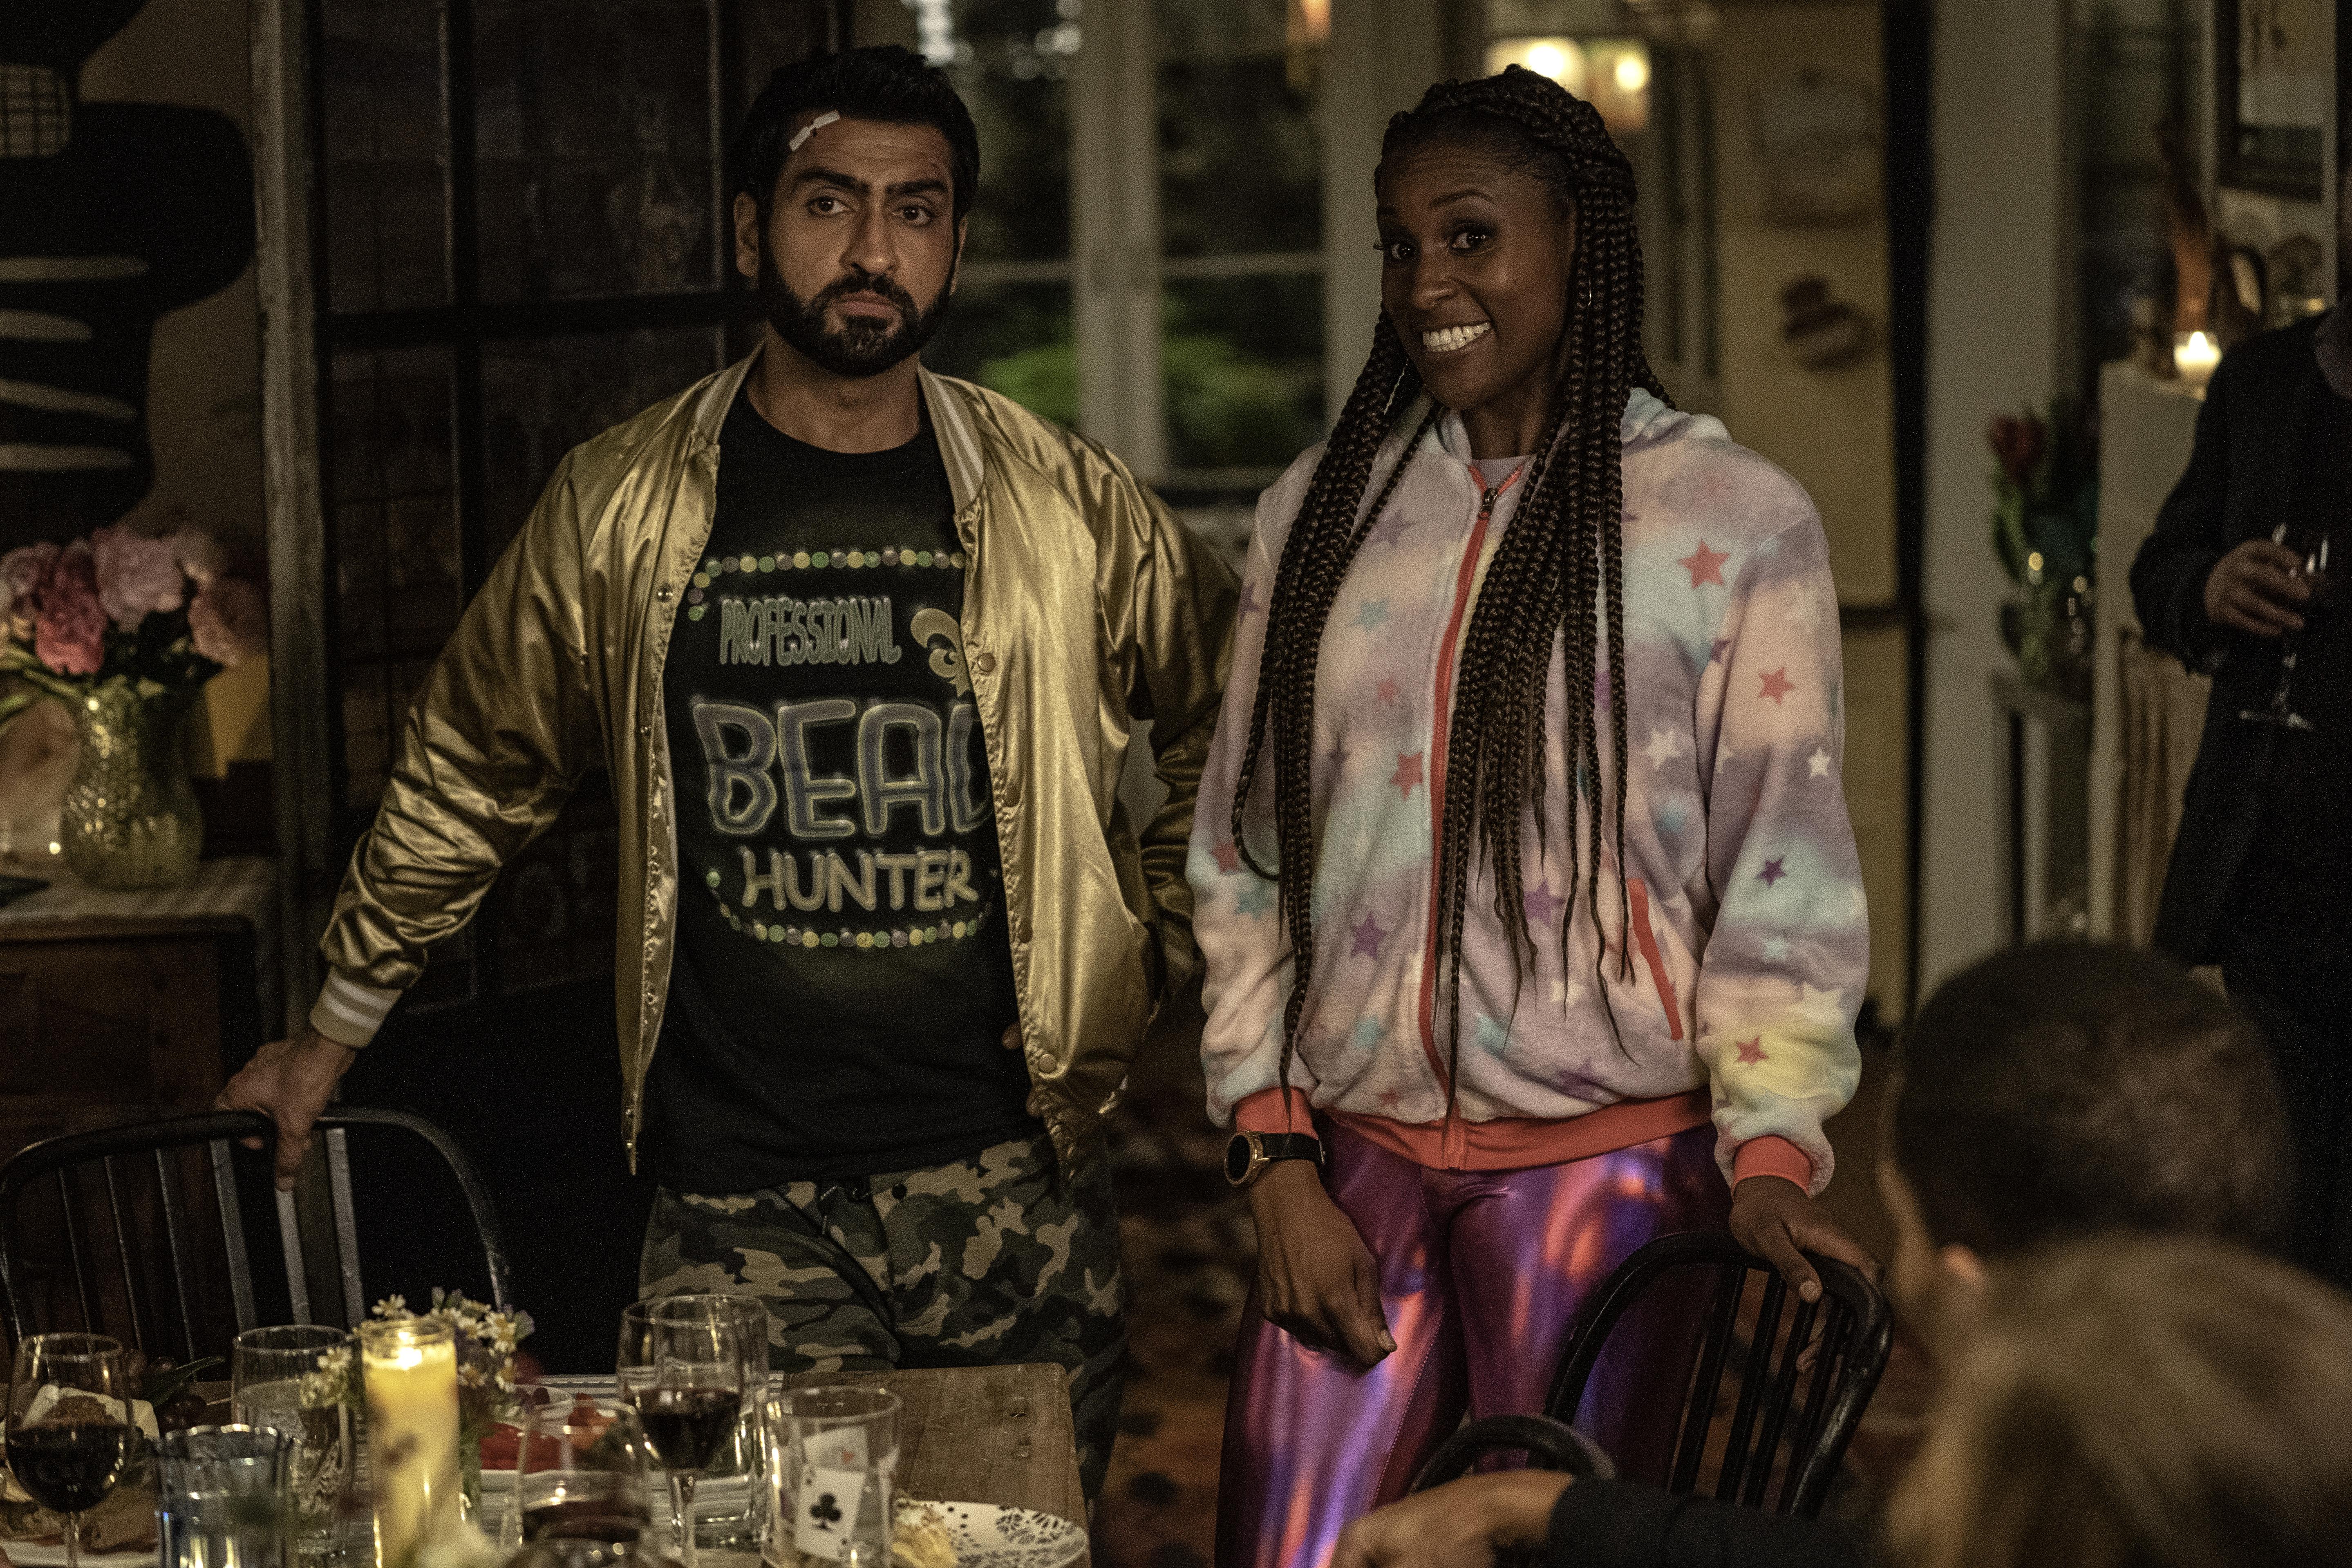 Kumail Nanjiana and Issa Rae in 'The Lovebirds' on Netflix.